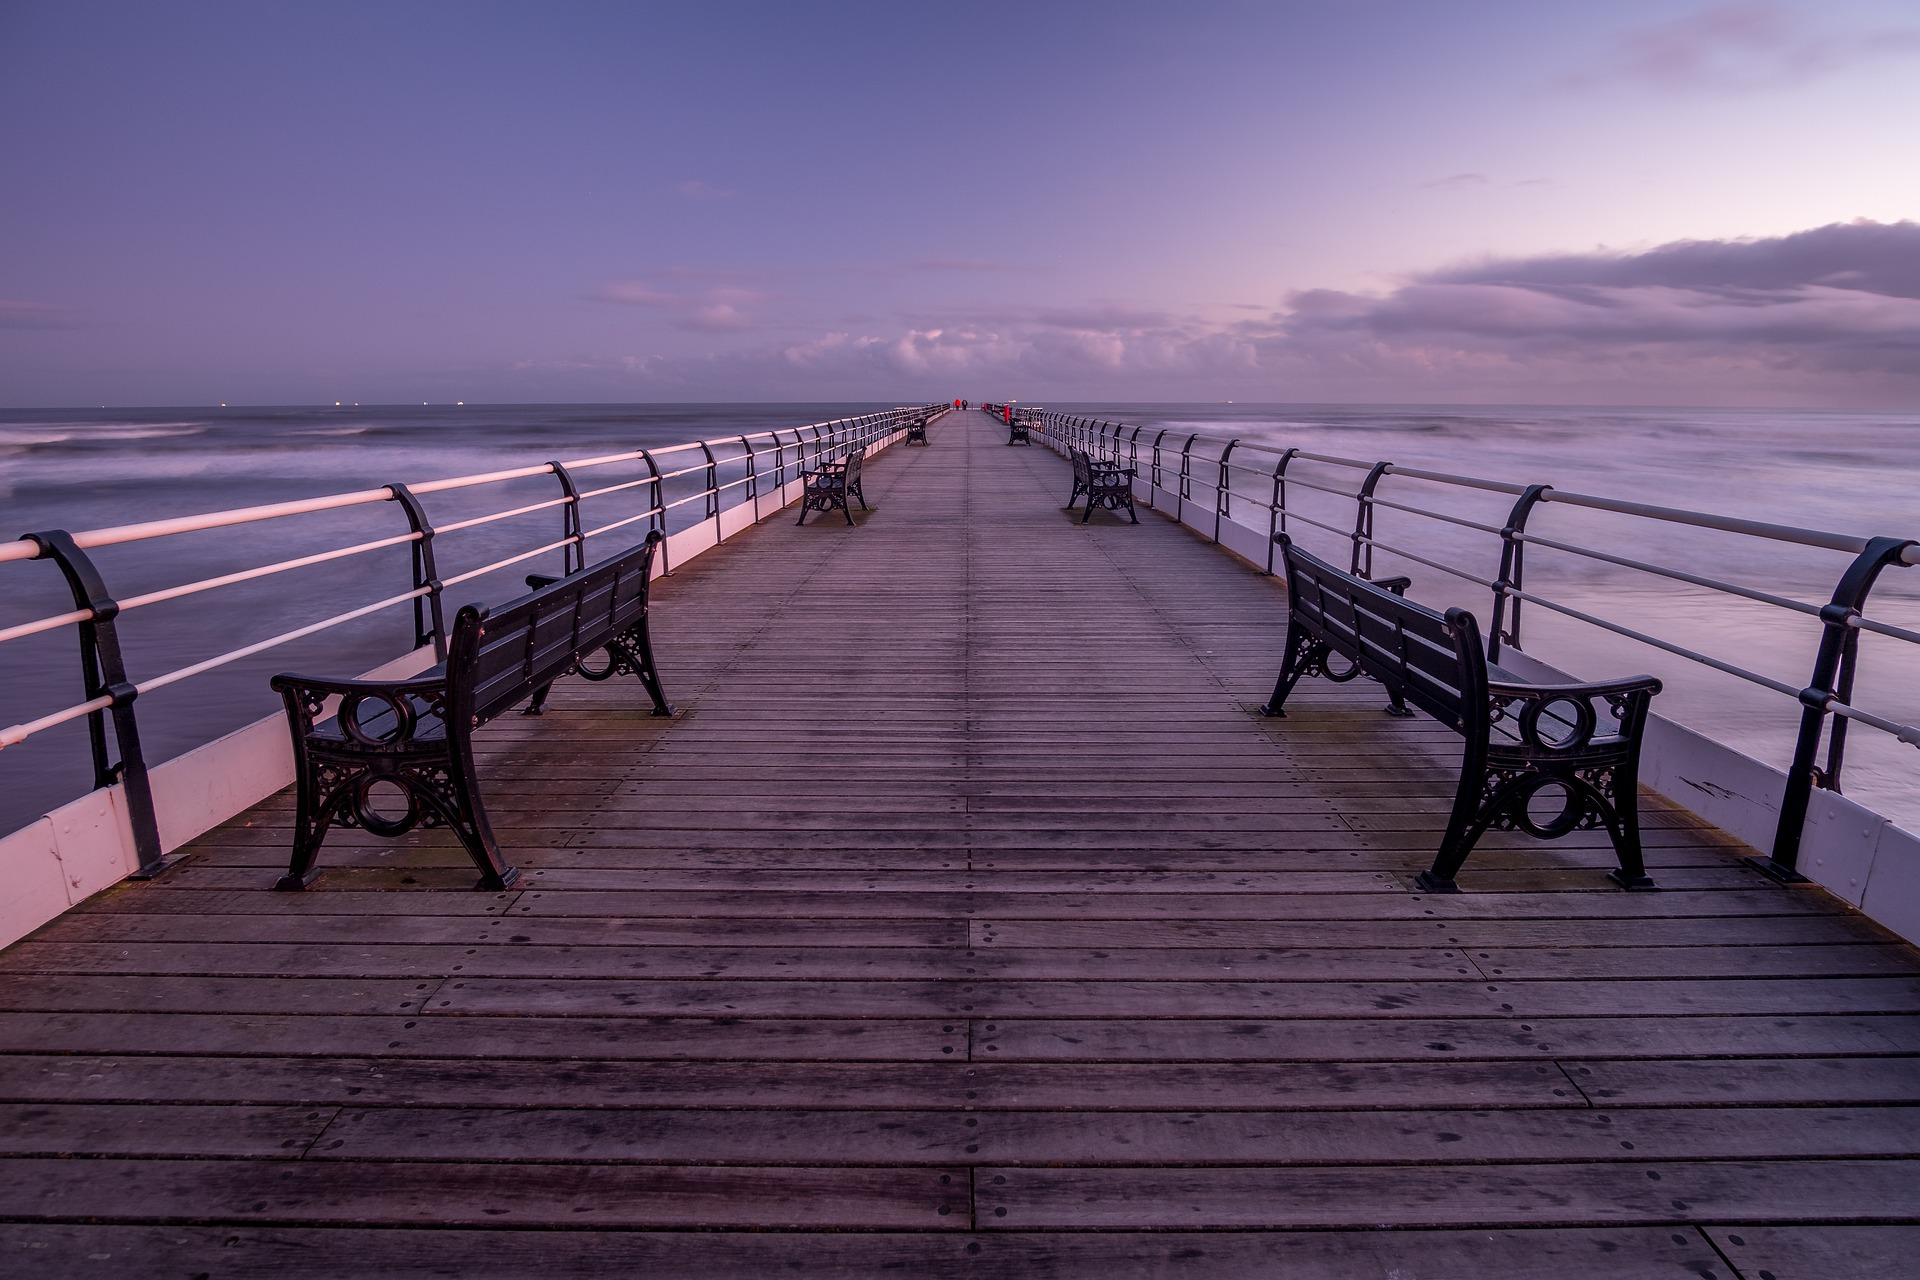 Best Seaside Towns in Yorkshire